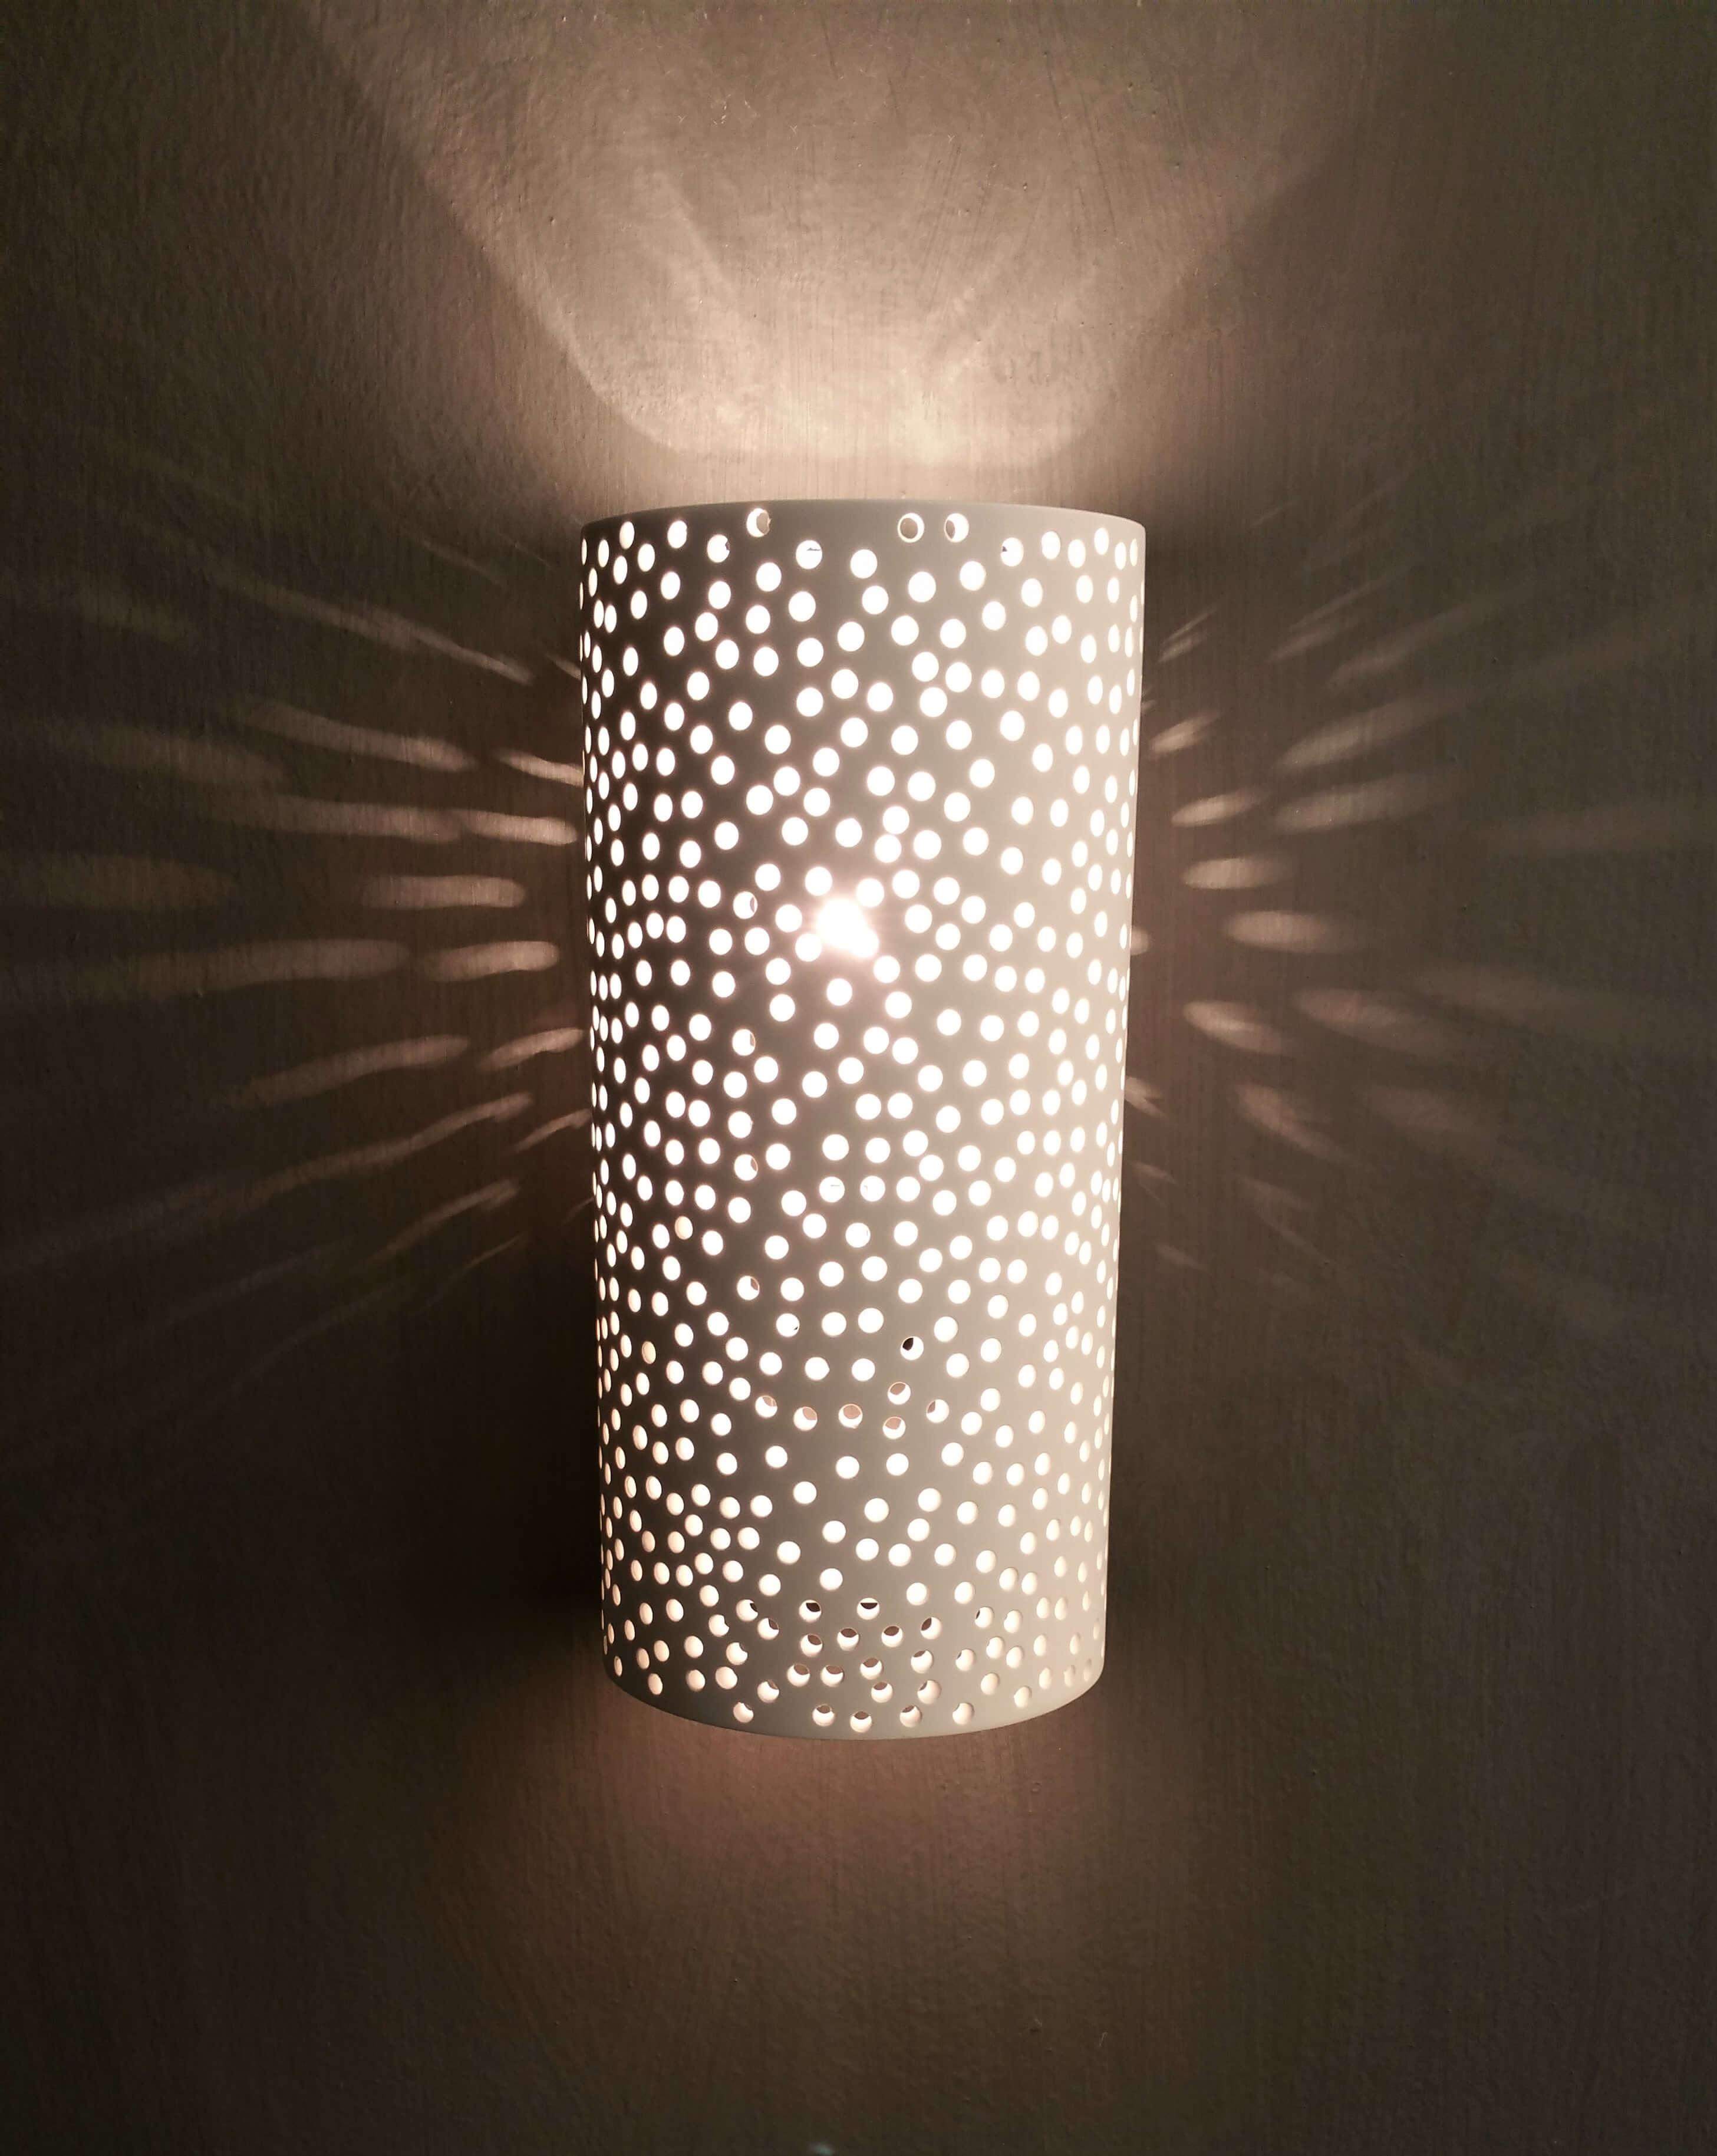 Santorini gypsum wall light on architectural lighting for hotel project. Φωτιστικό Santorini απλίκα γύψινη αρχιτεκτονικού φωτιστισμου ιδανικο για ξενοδοχεία